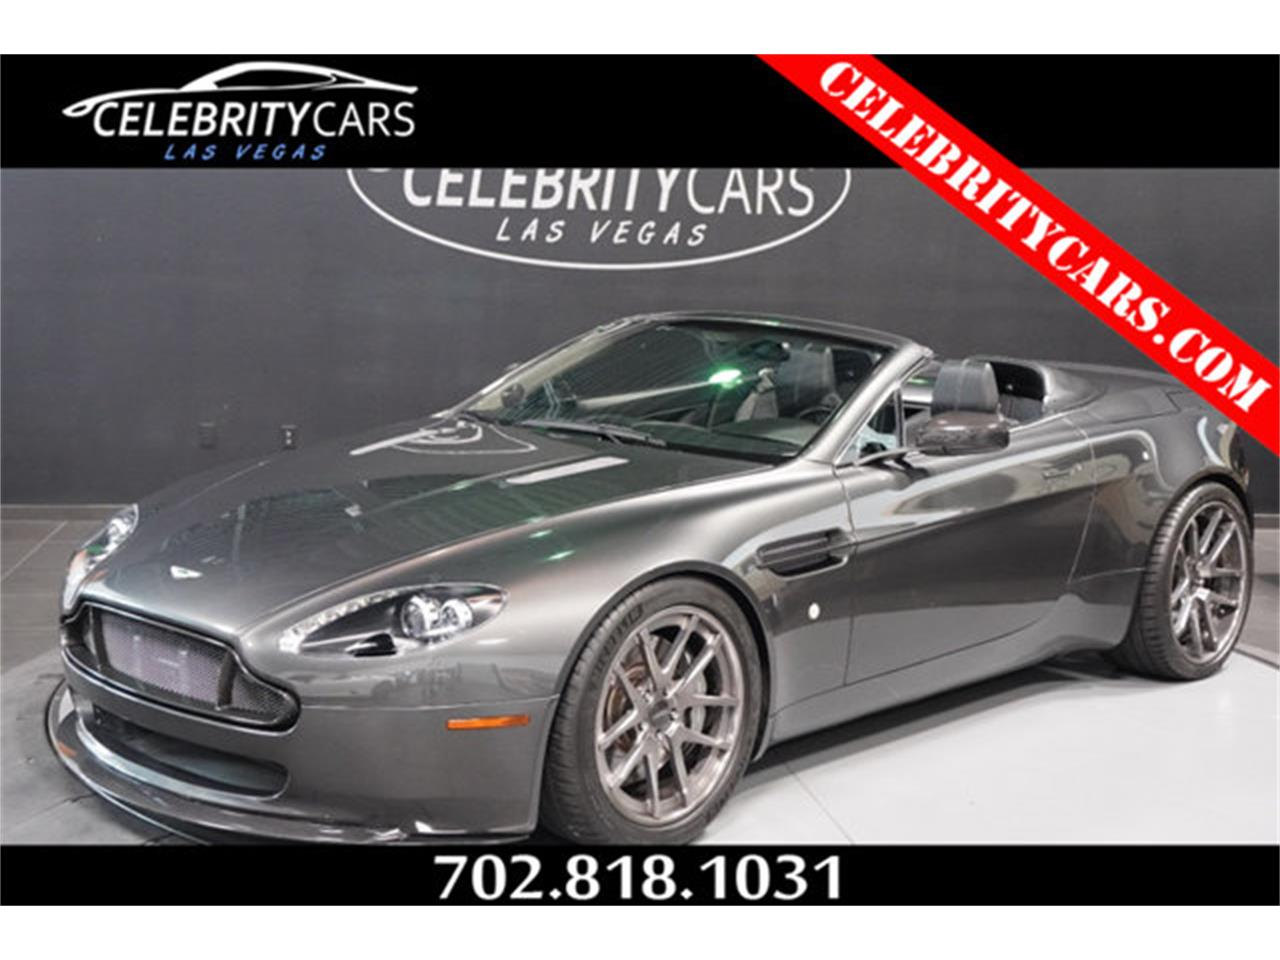 2009 Aston Martin Vantage For Sale In Las Vegas Nv Classiccarsbay Com